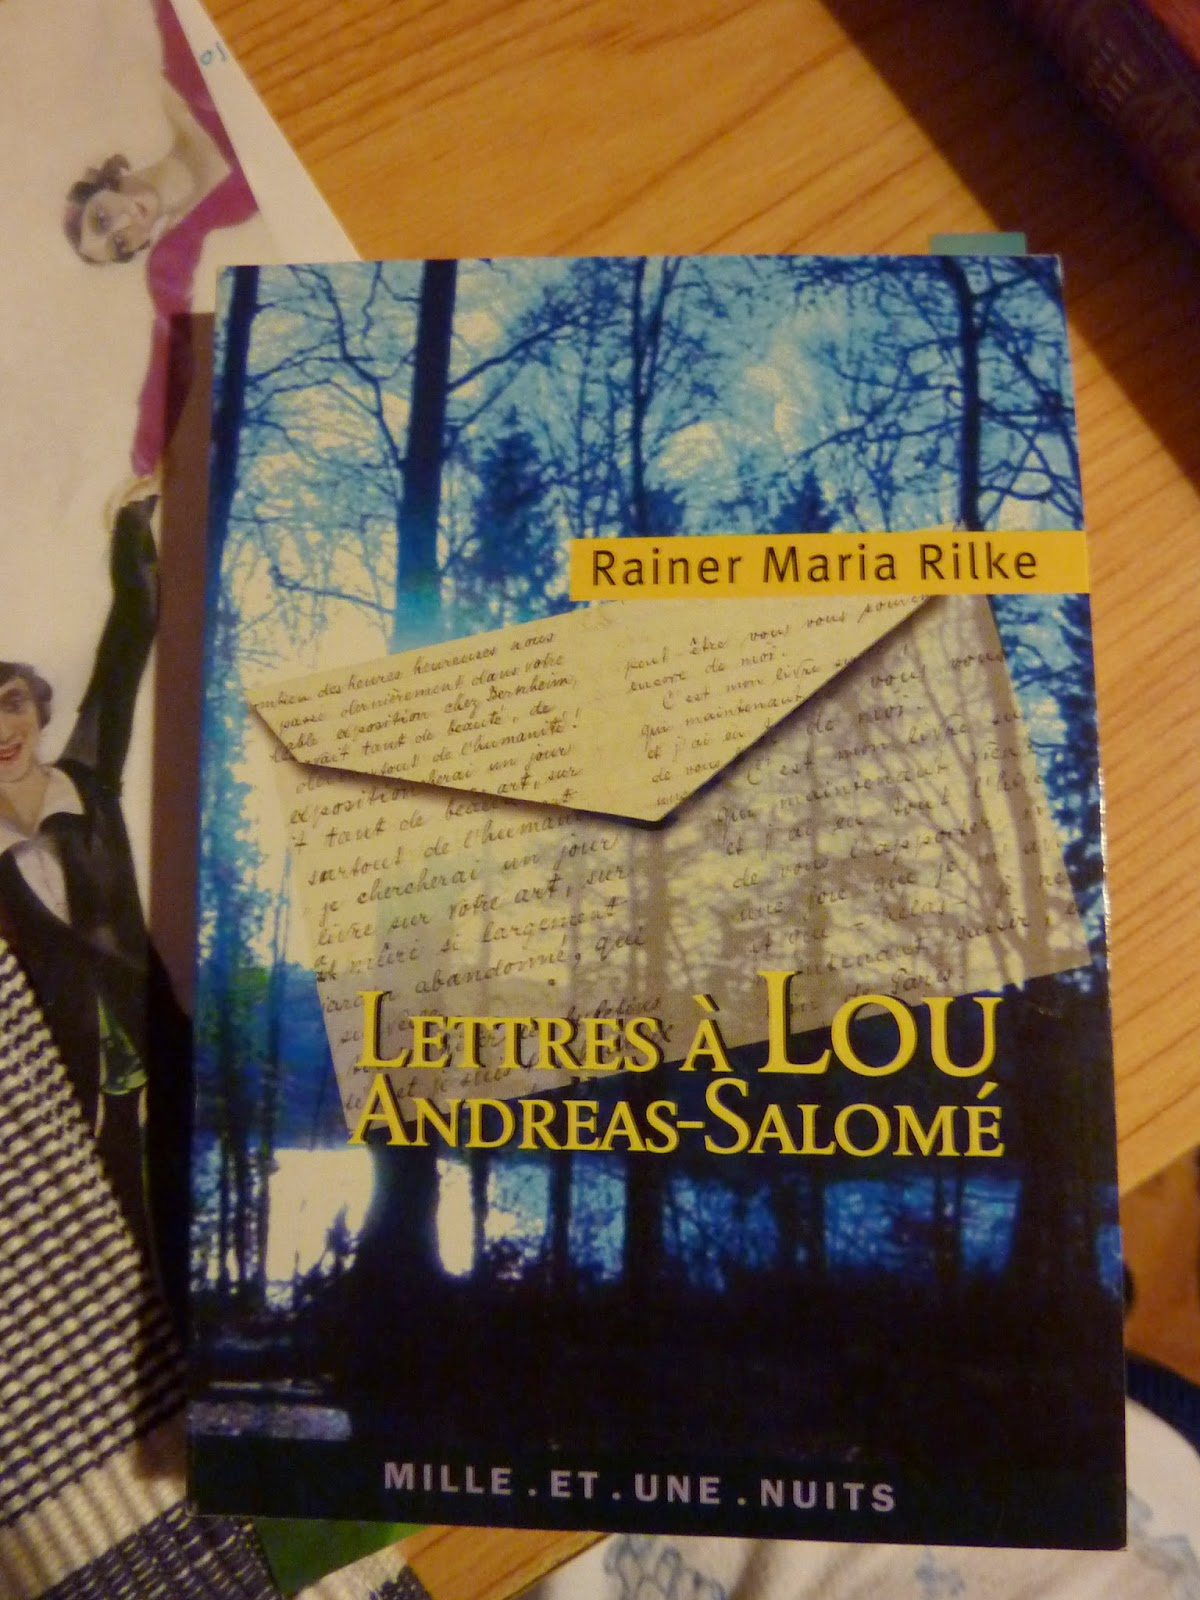 Lettres à Lou - Rilke